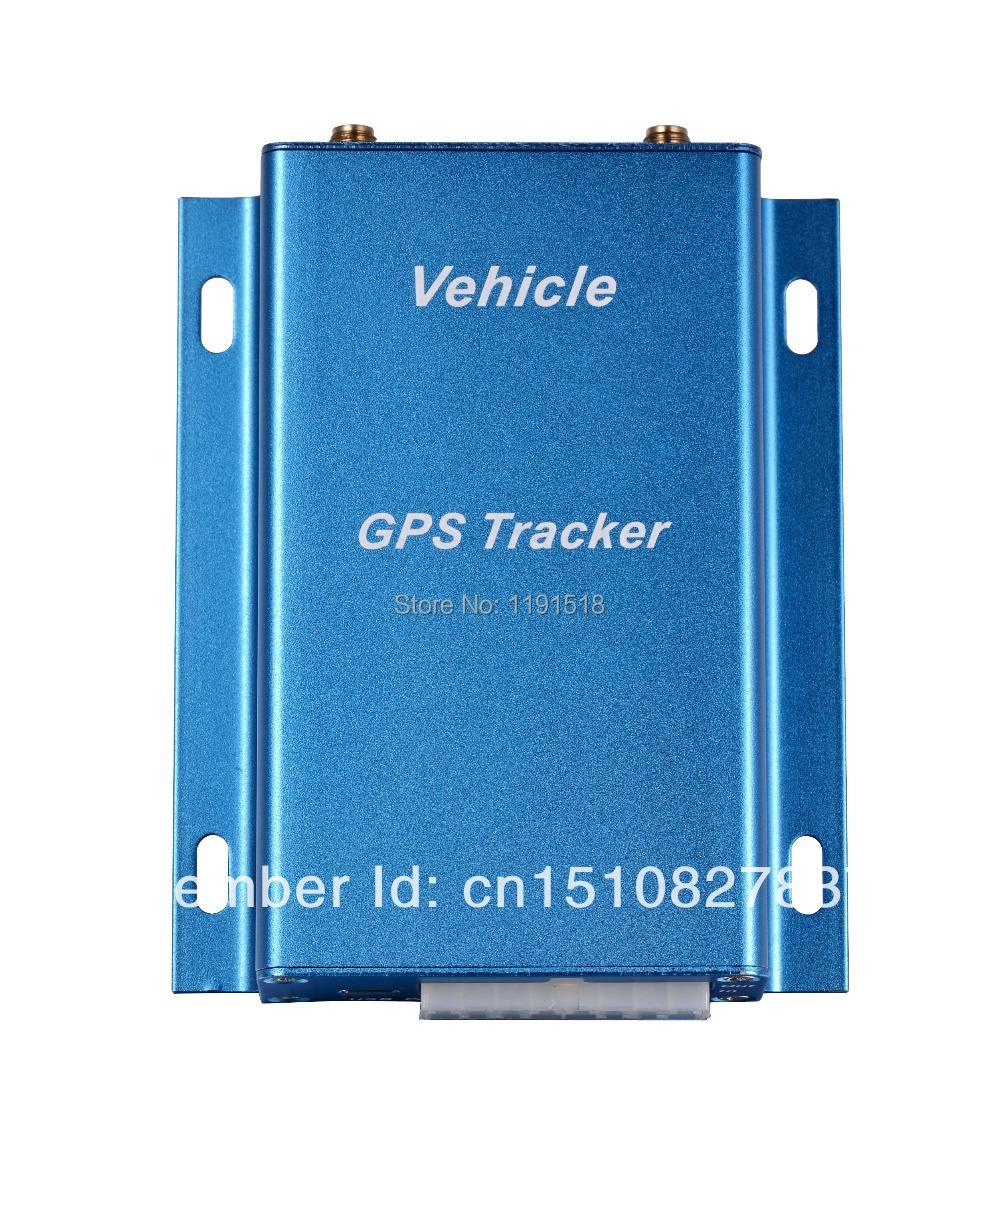 GPS Tracker Vehicle Tracking Device Car GPS Tracking Device AVL GPS Tracking With Listen-in VT310(China (Mainland))